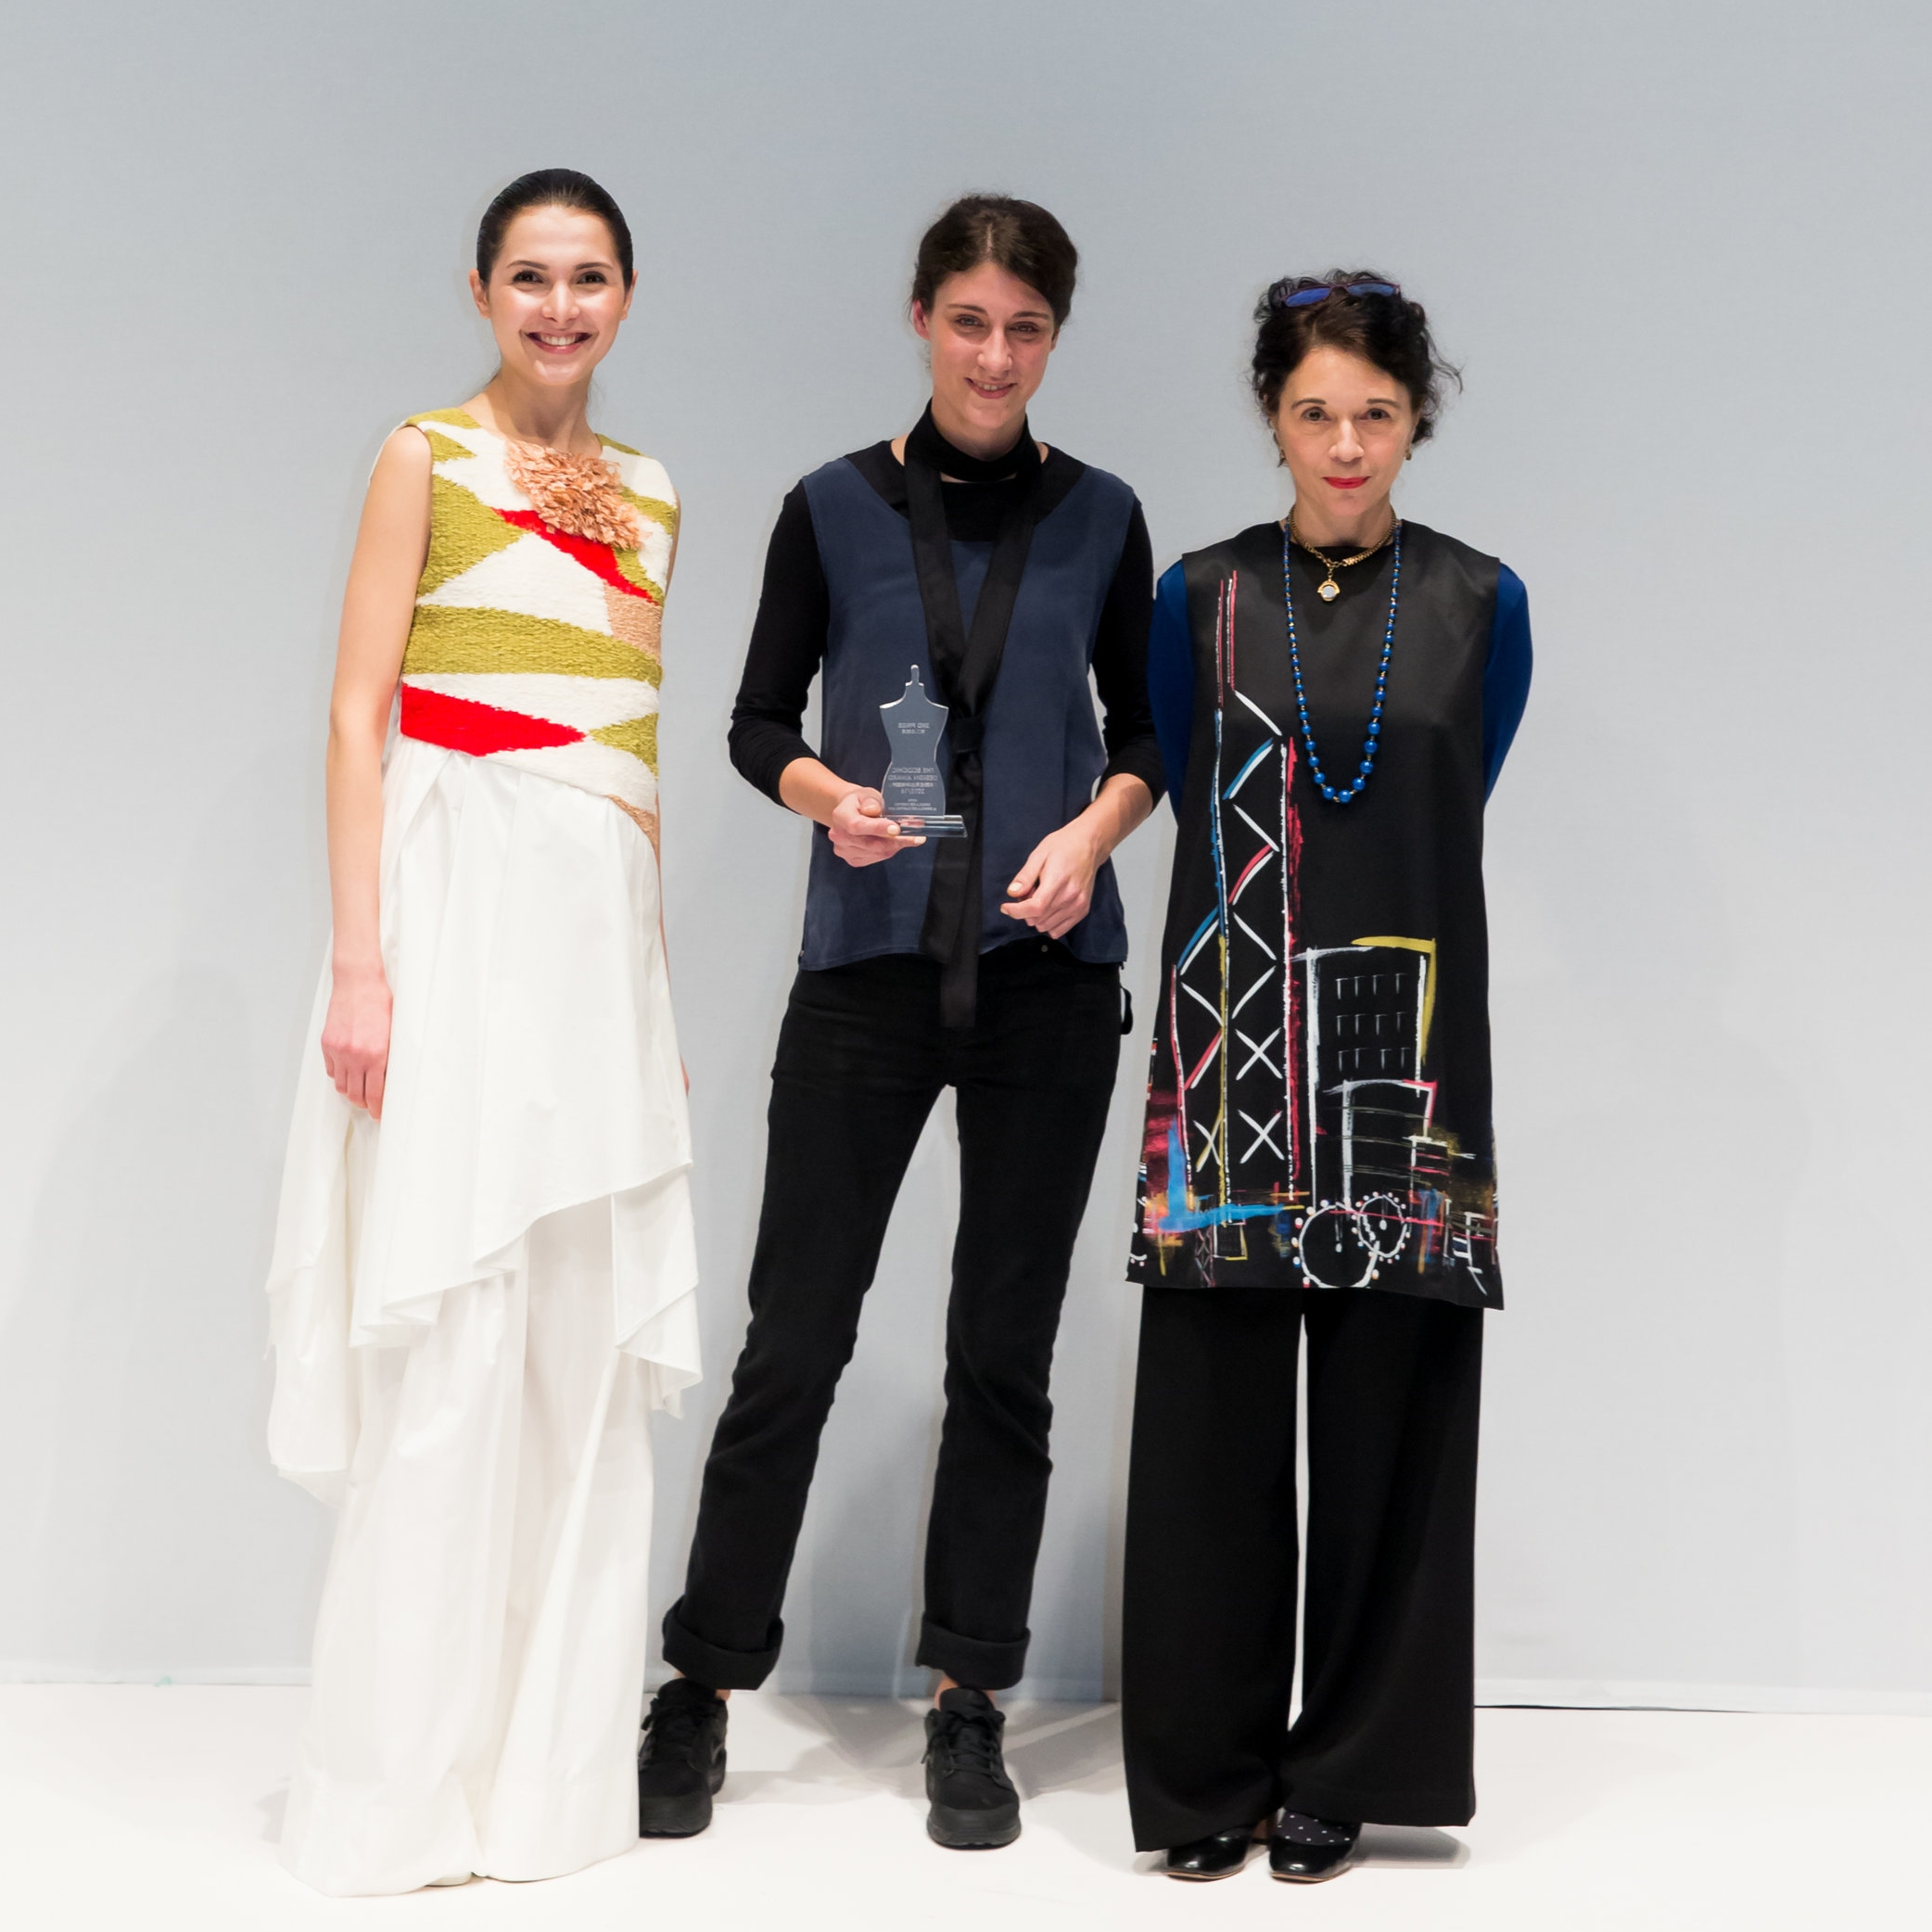 Second prize: The EcoChic Design Award 2015/16 Mentorship with Orsola De Castro   Cora Maria Bellotto, Spain